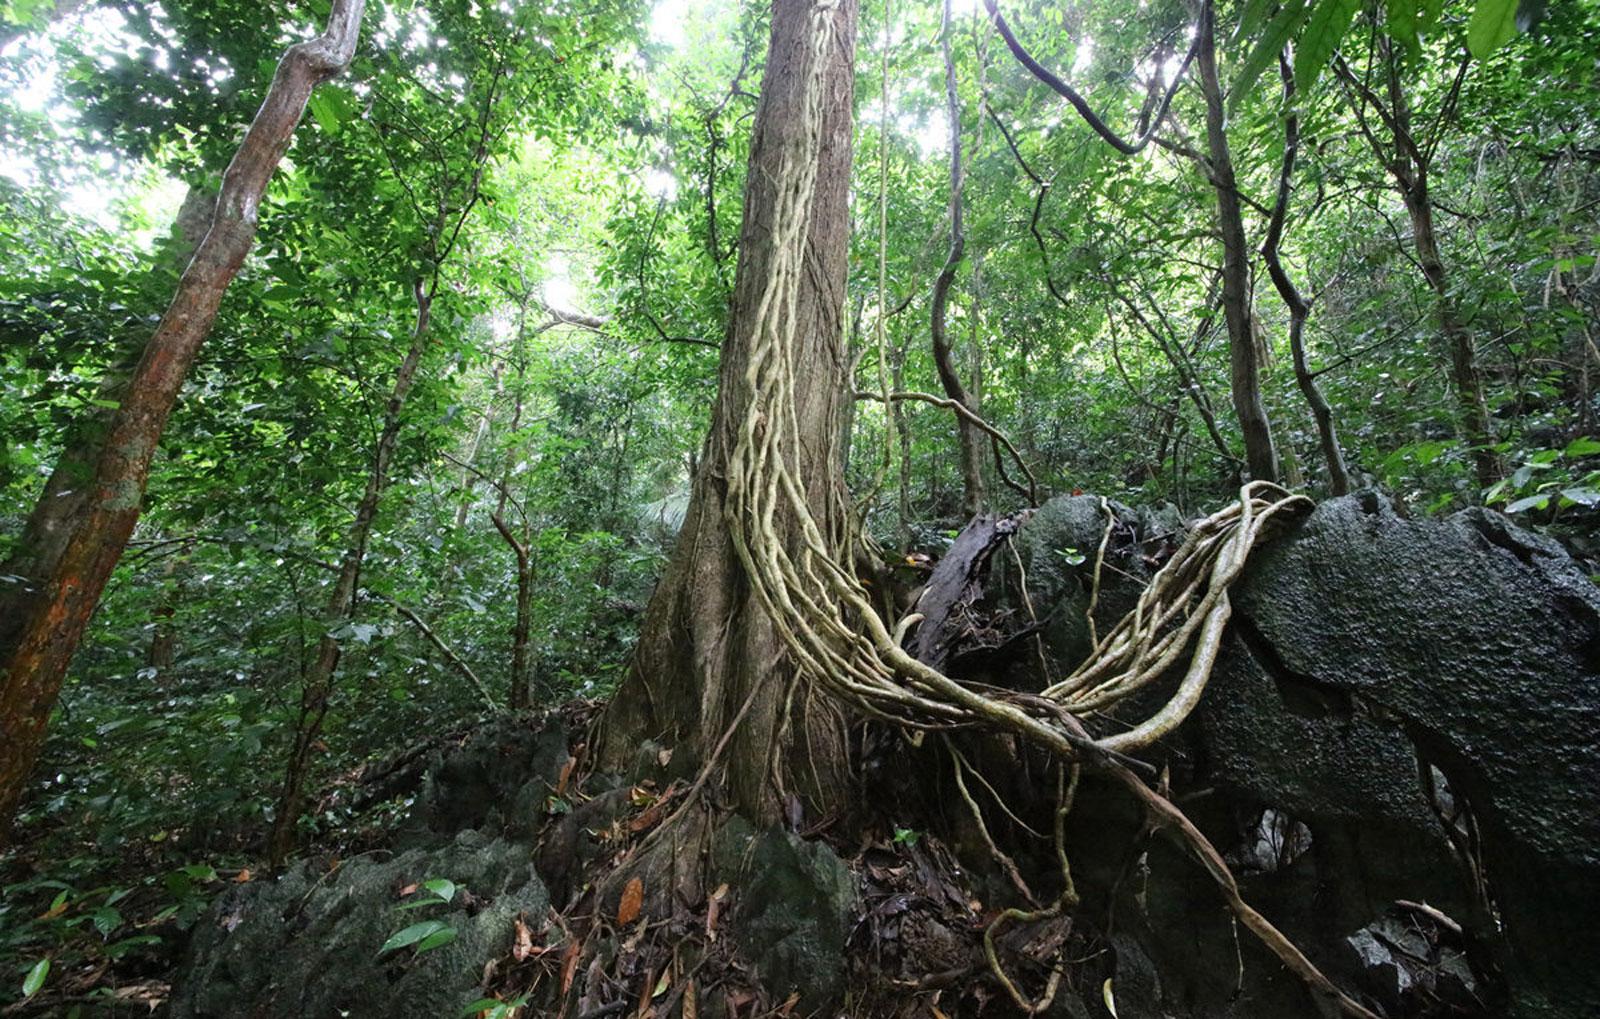 'Drastic forest development': Vietnam to plant 1 billion trees – but how?